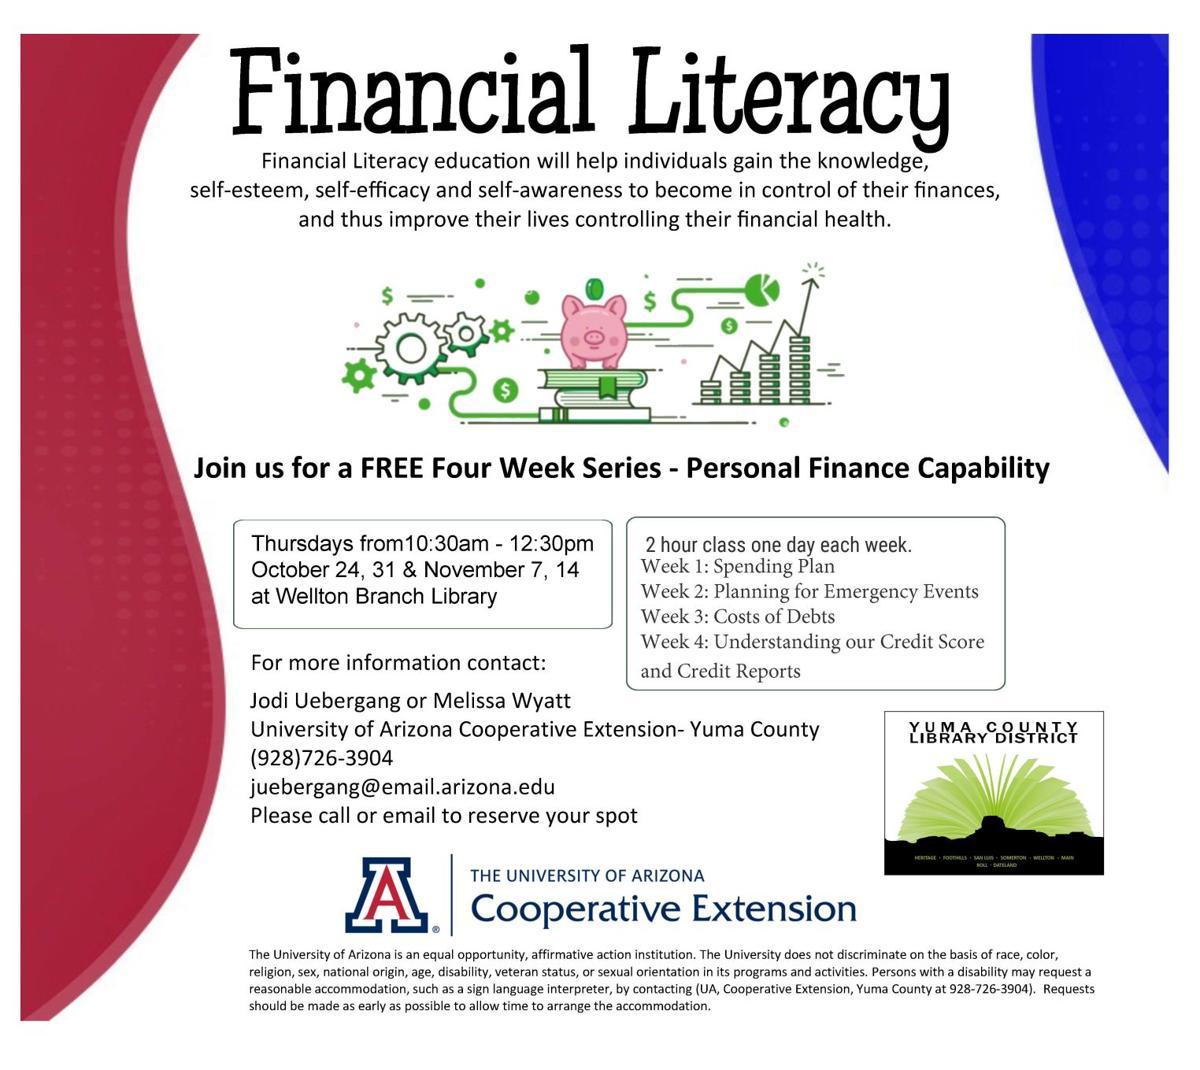 Personal Finance Capability, Financial Education, Wellton